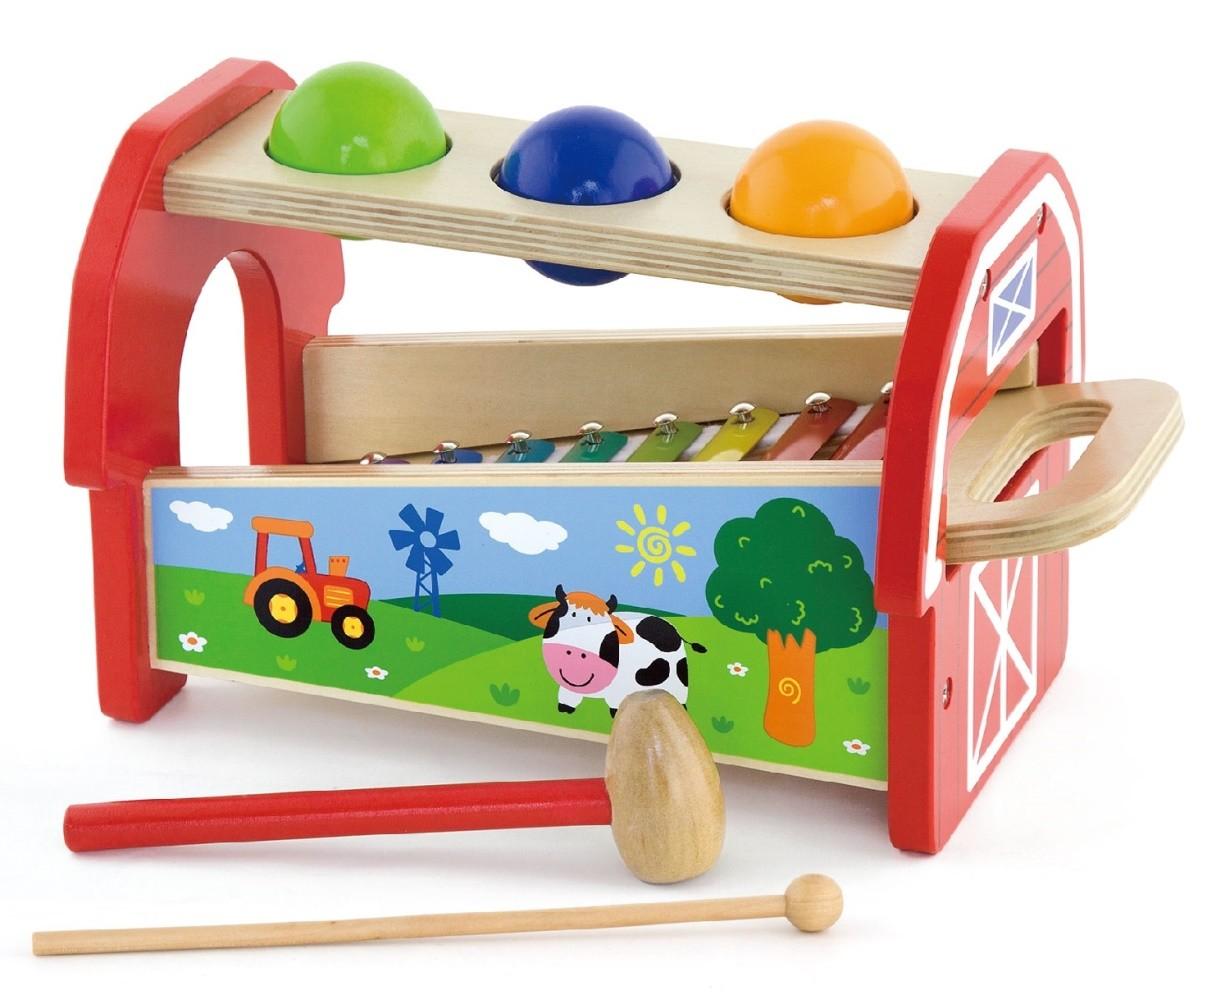 Детски ксилофон с чукче и топки от Viga toys - бебешка играчка - детски музикални инструменти - Bellamie